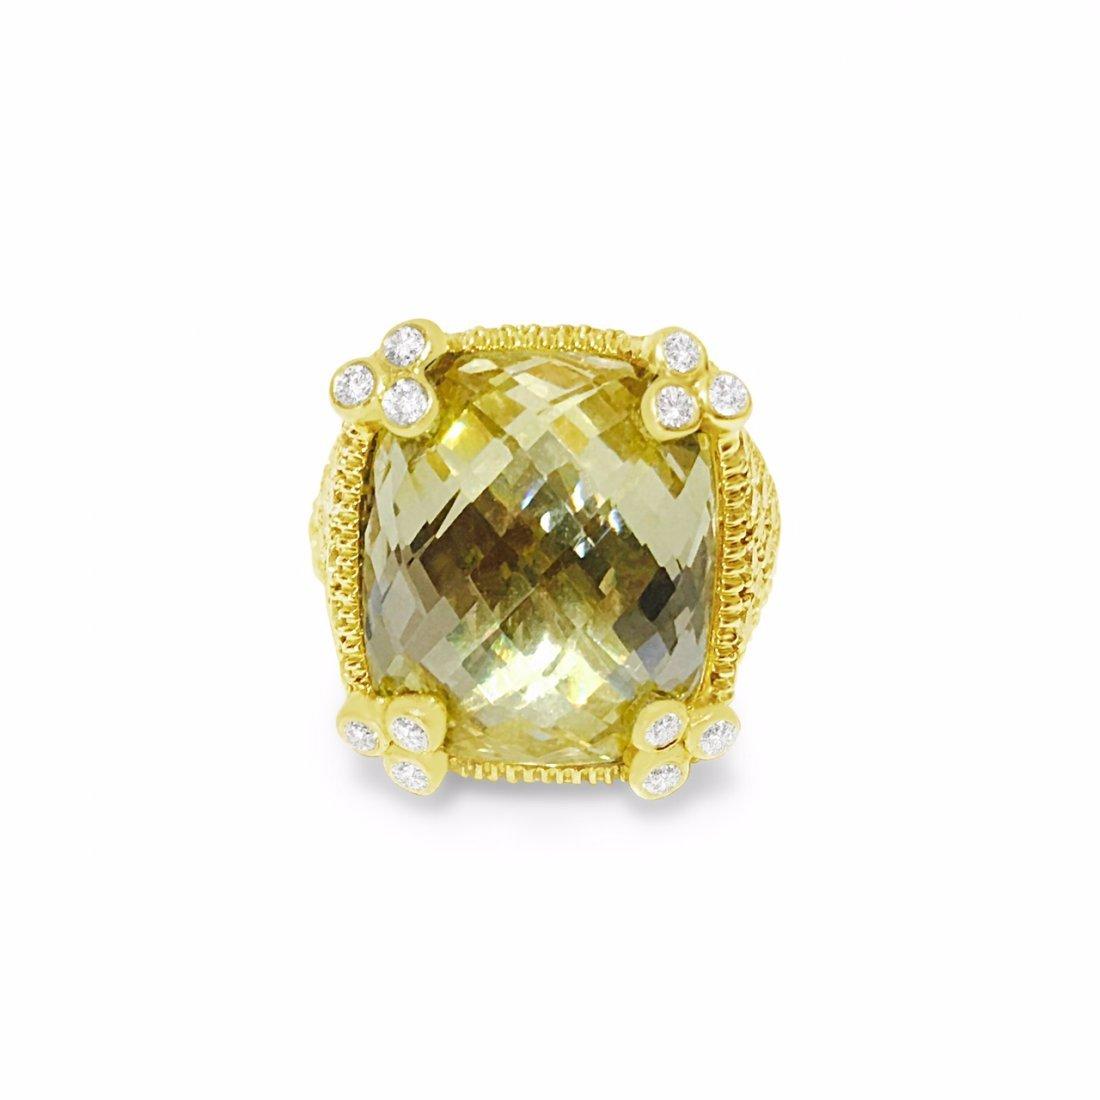 Judith Ripka 18K Gold Natural Diamond Cocktail Ring - 3